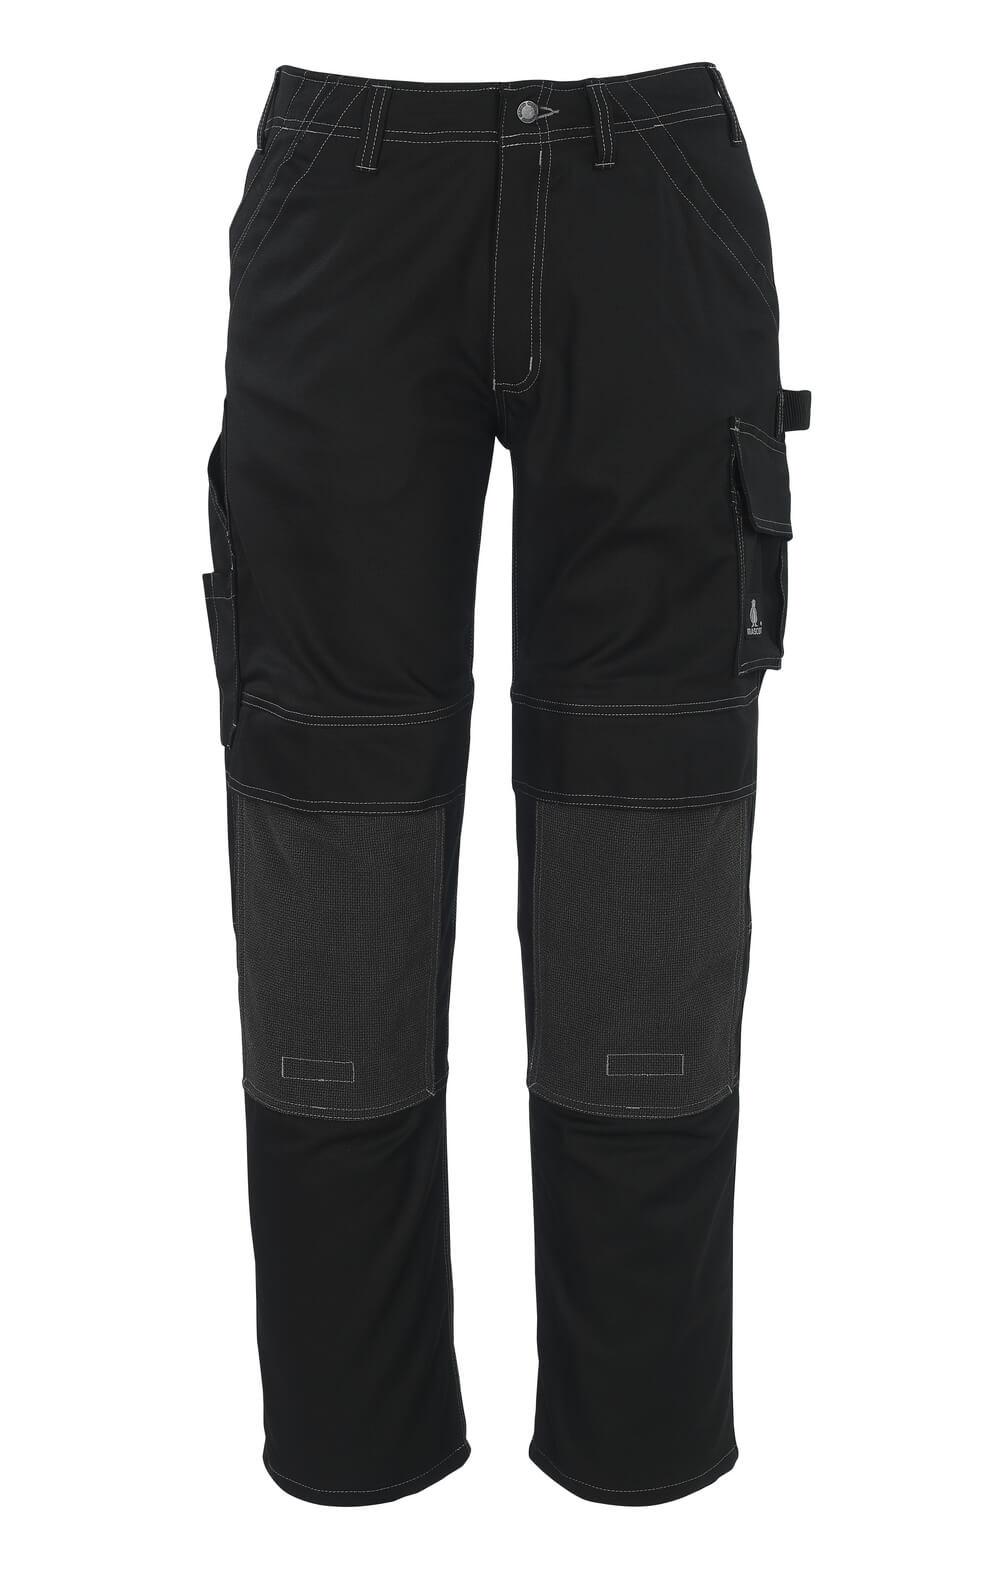 05079-010-09 Pantalones con bolsillos para rodilleras - negro